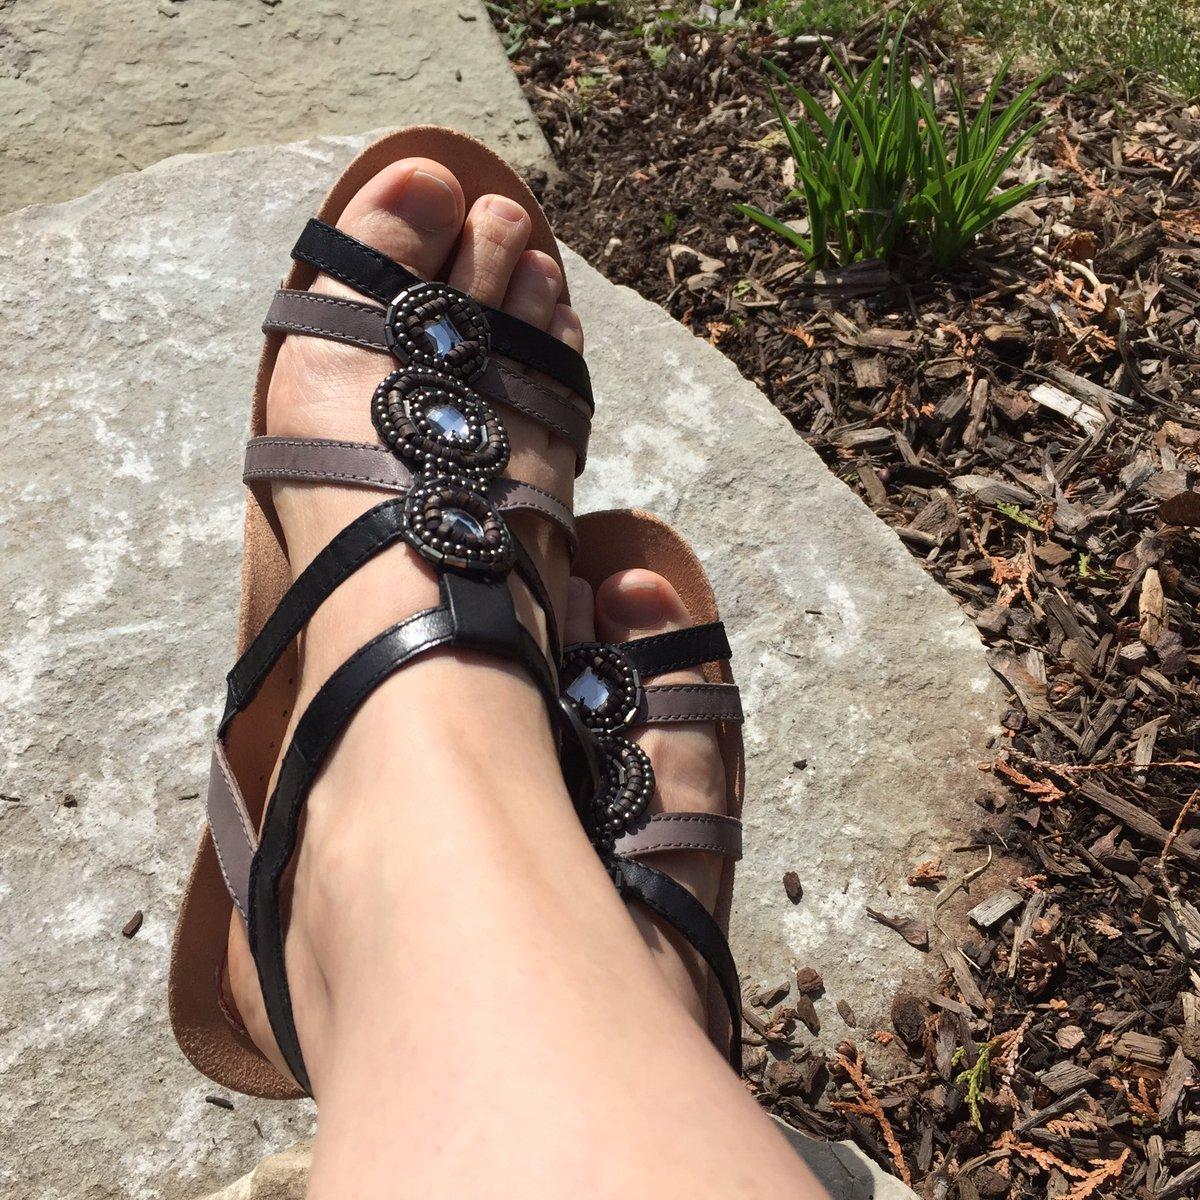 test Twitter Media - RT @KelliZG: Finally! The perfect weather to wear my new @Rockport Hannah sandals. ☀️@gradyshoes #happyfeet https://t.co/FibarWGzzi